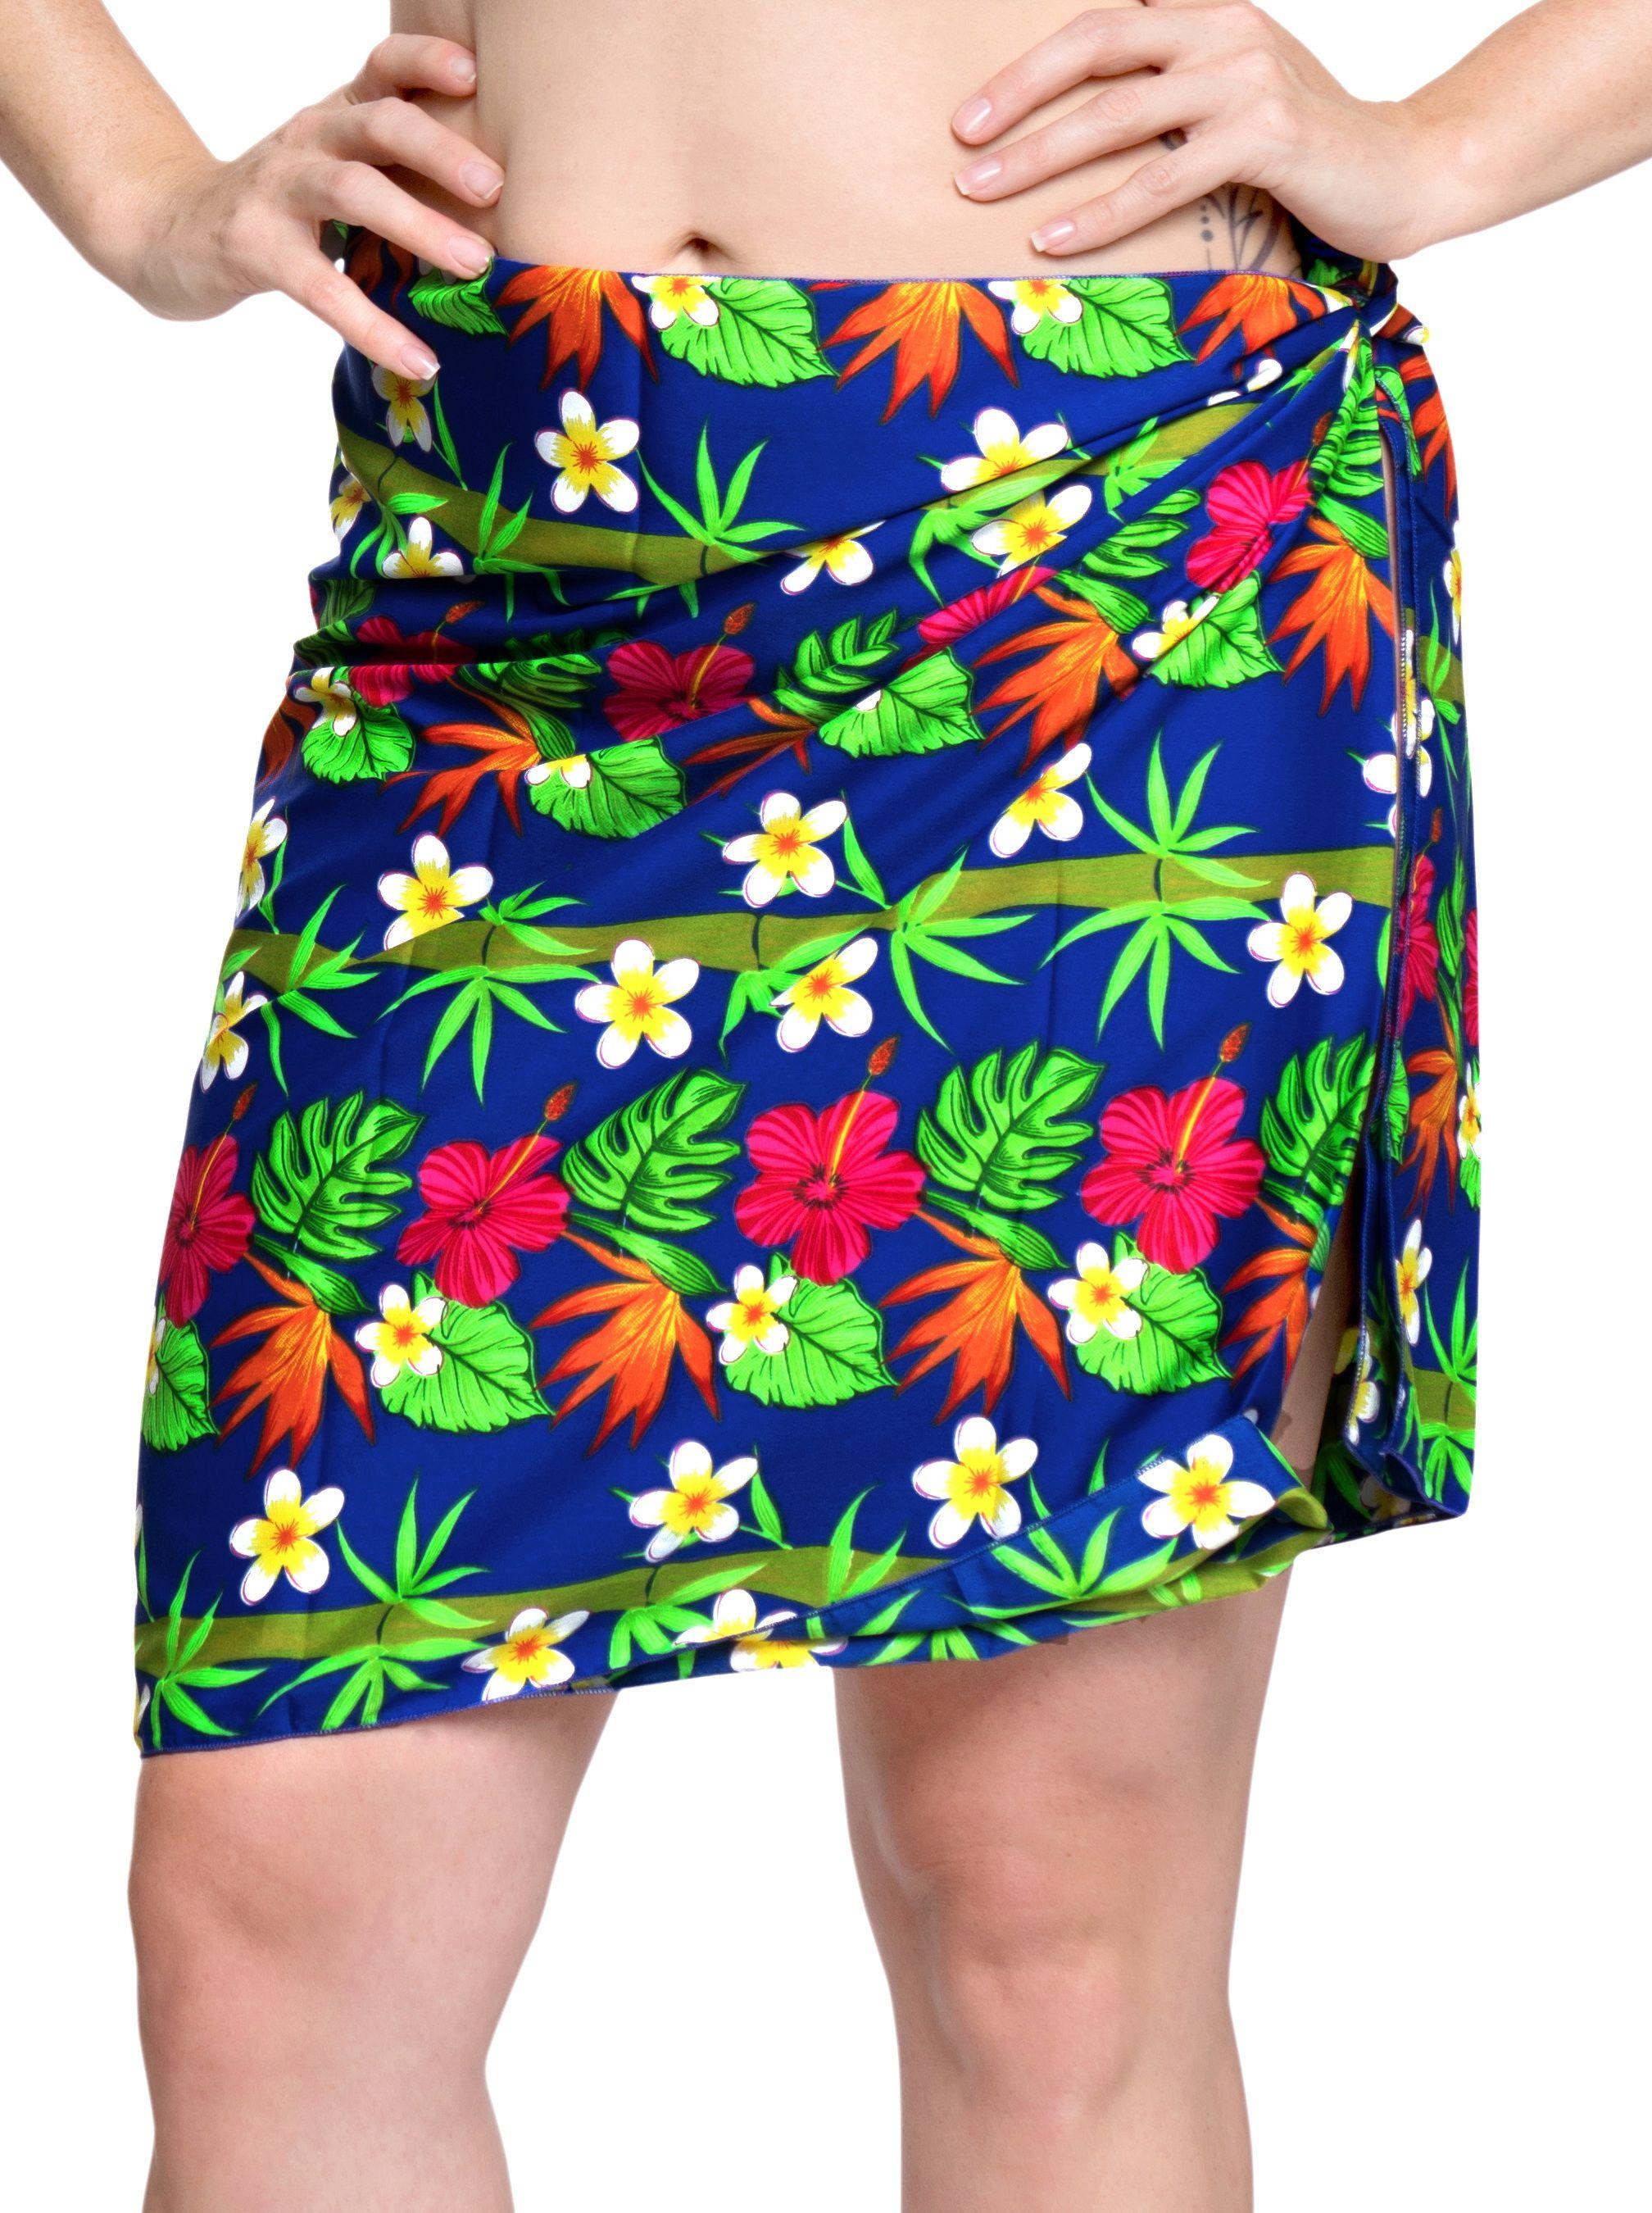 84777001b15c0 Mini/Half Sarong Bikini Cover ups Wrap Aloha Swimsuit Swim Beachwear Dress  Scarf#Cover, #ups, #Wrap